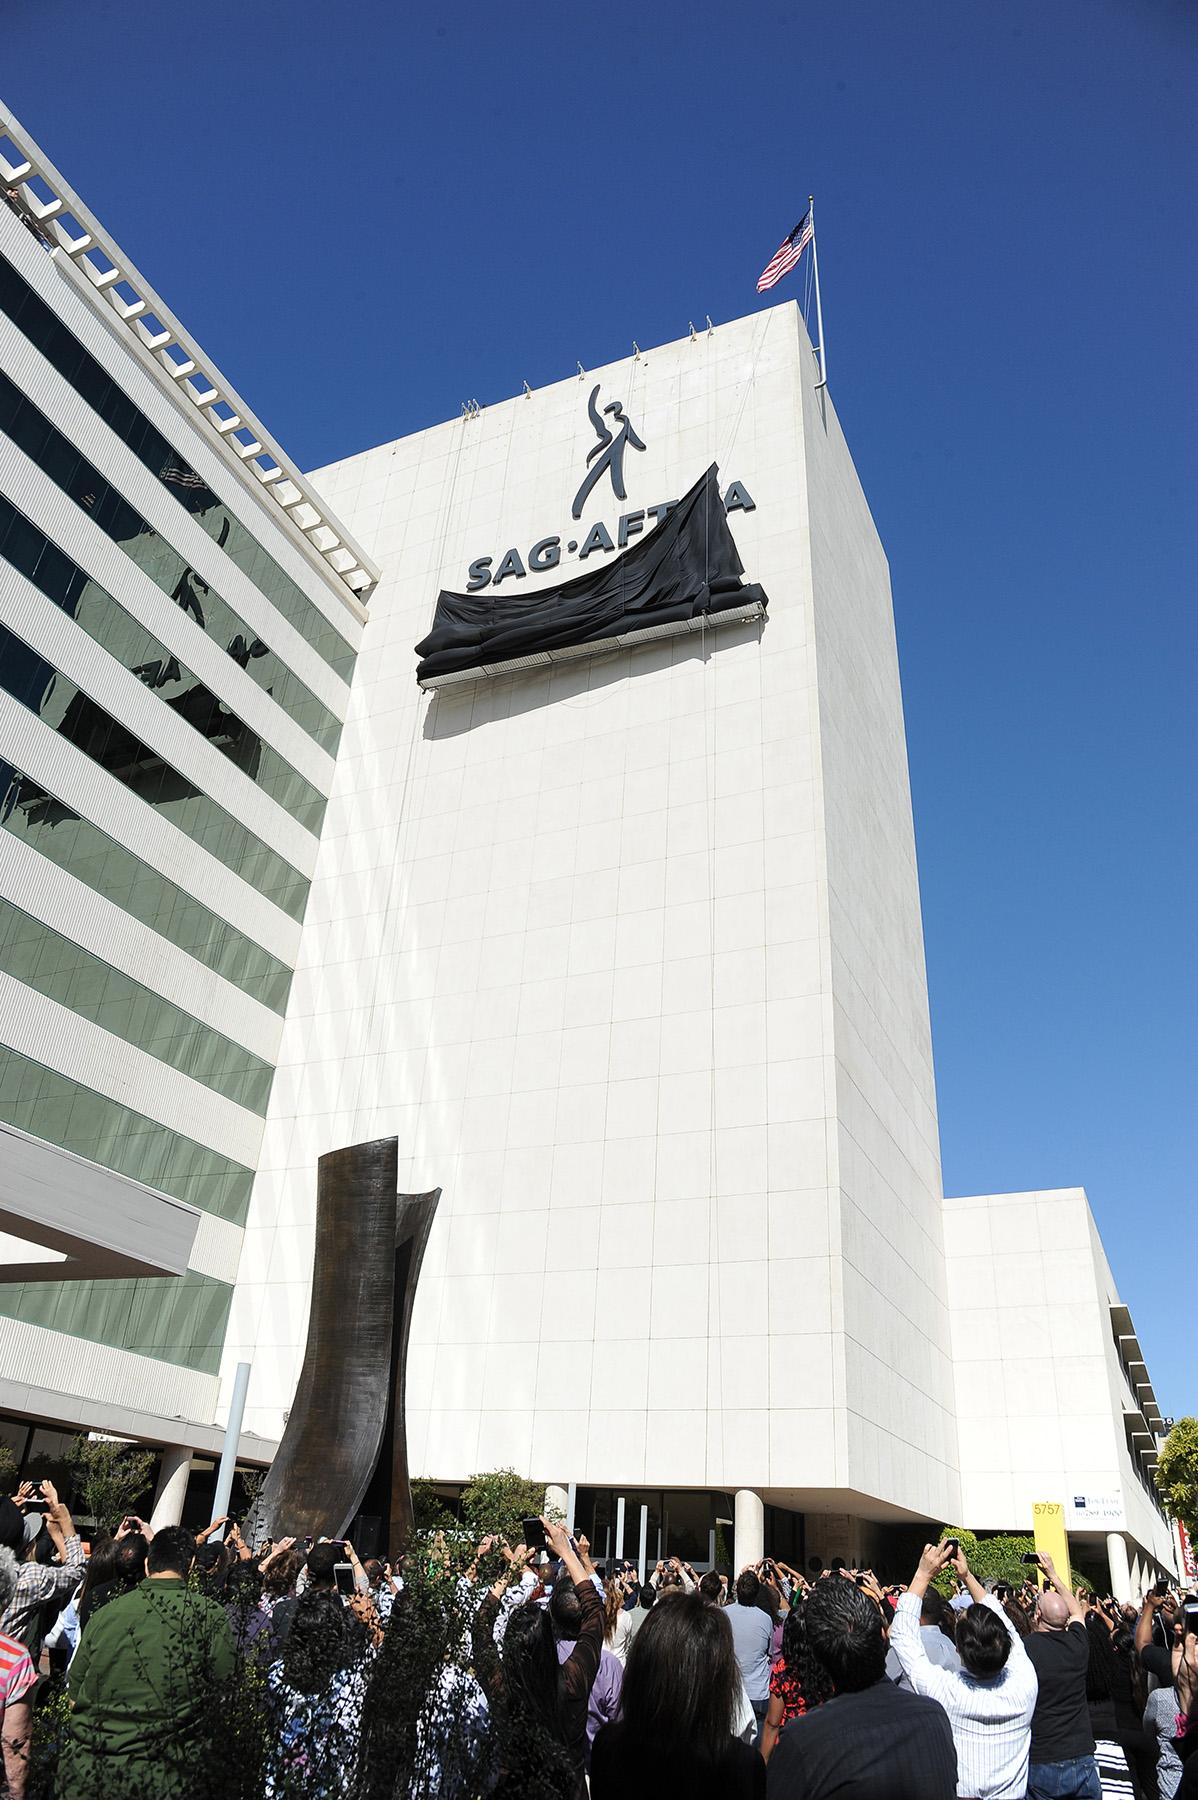 SAG AFTRA HQ Signage - P 2015